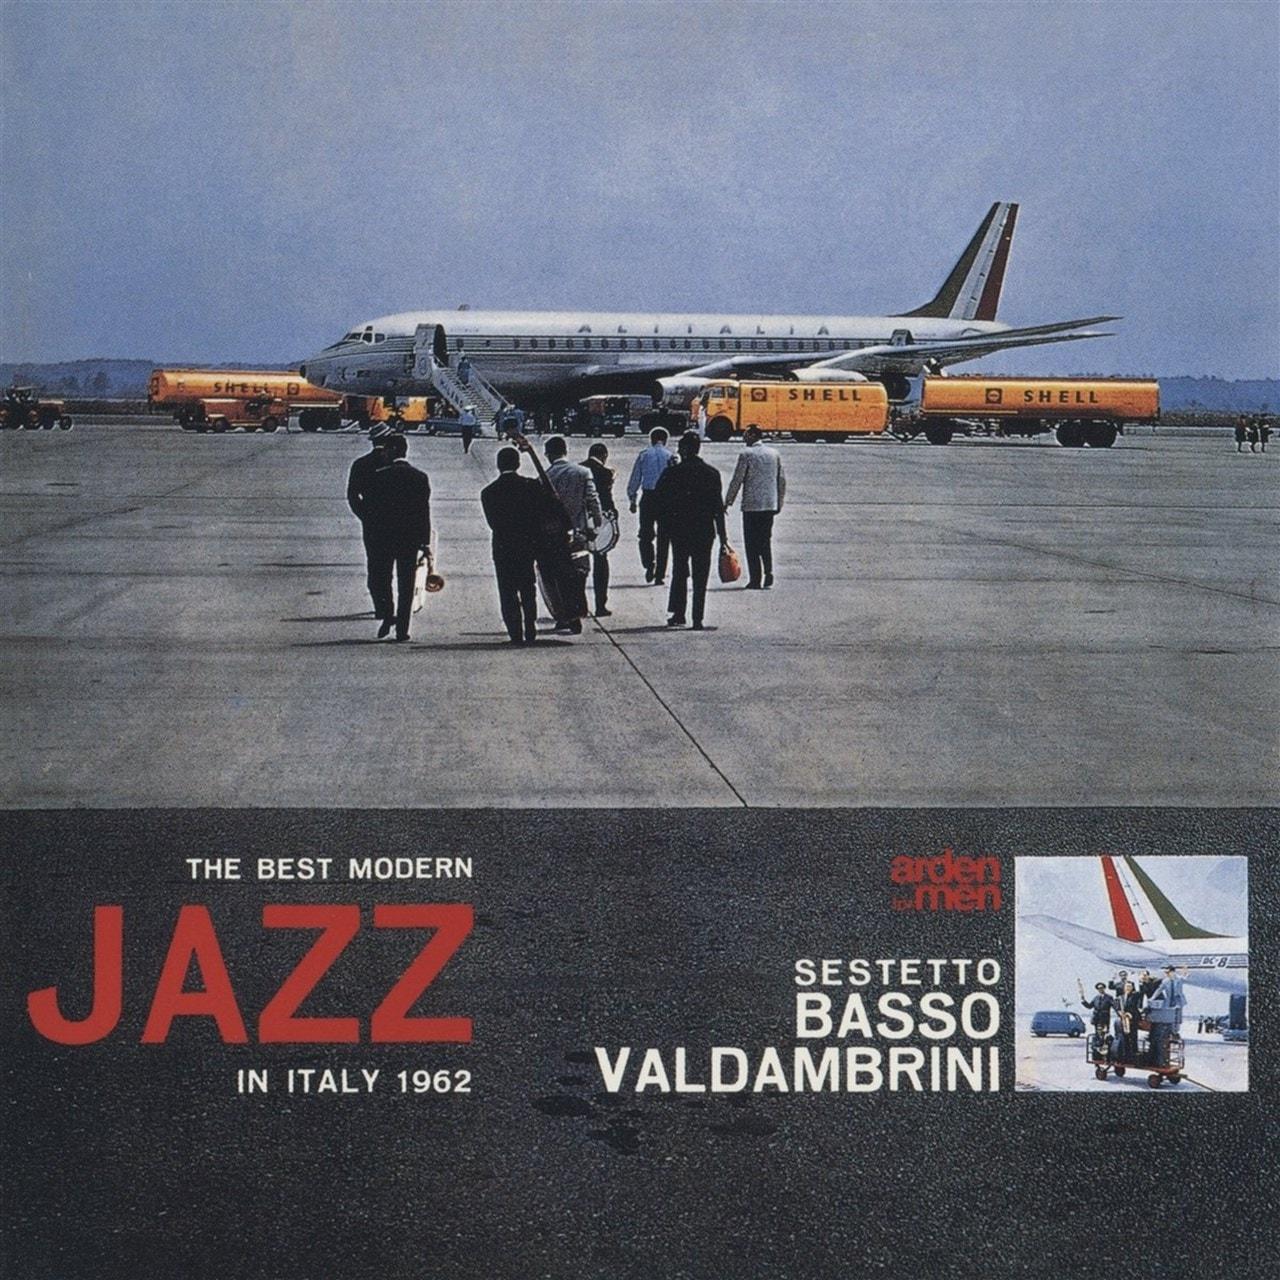 The Best Modern Jazz in Italy 1962 - 1